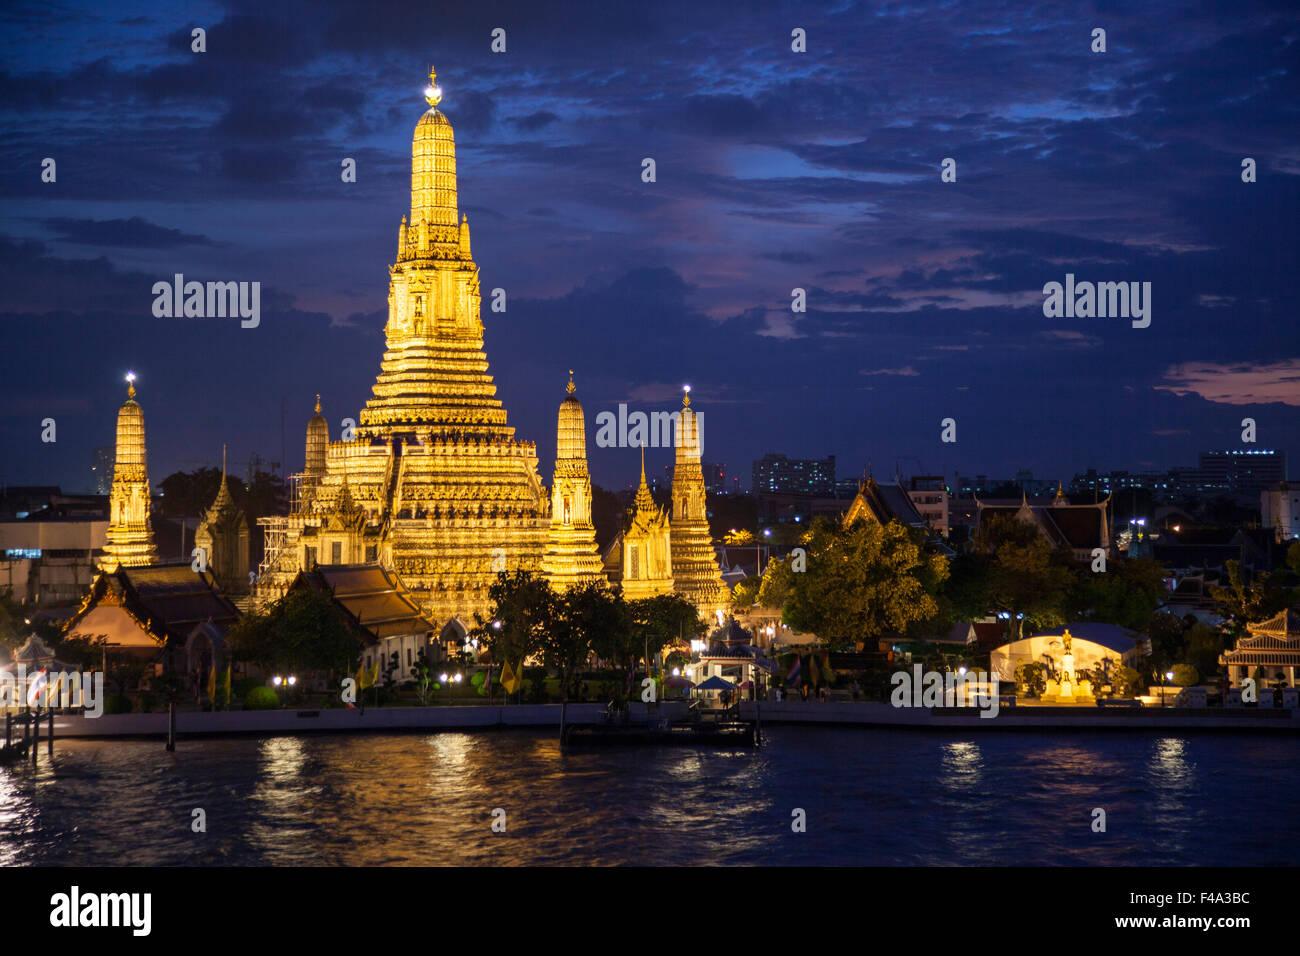 Thailand, Bangkok, night view of Wat Arun, Temple of Dawn and the Chao Phraya River - Stock Image